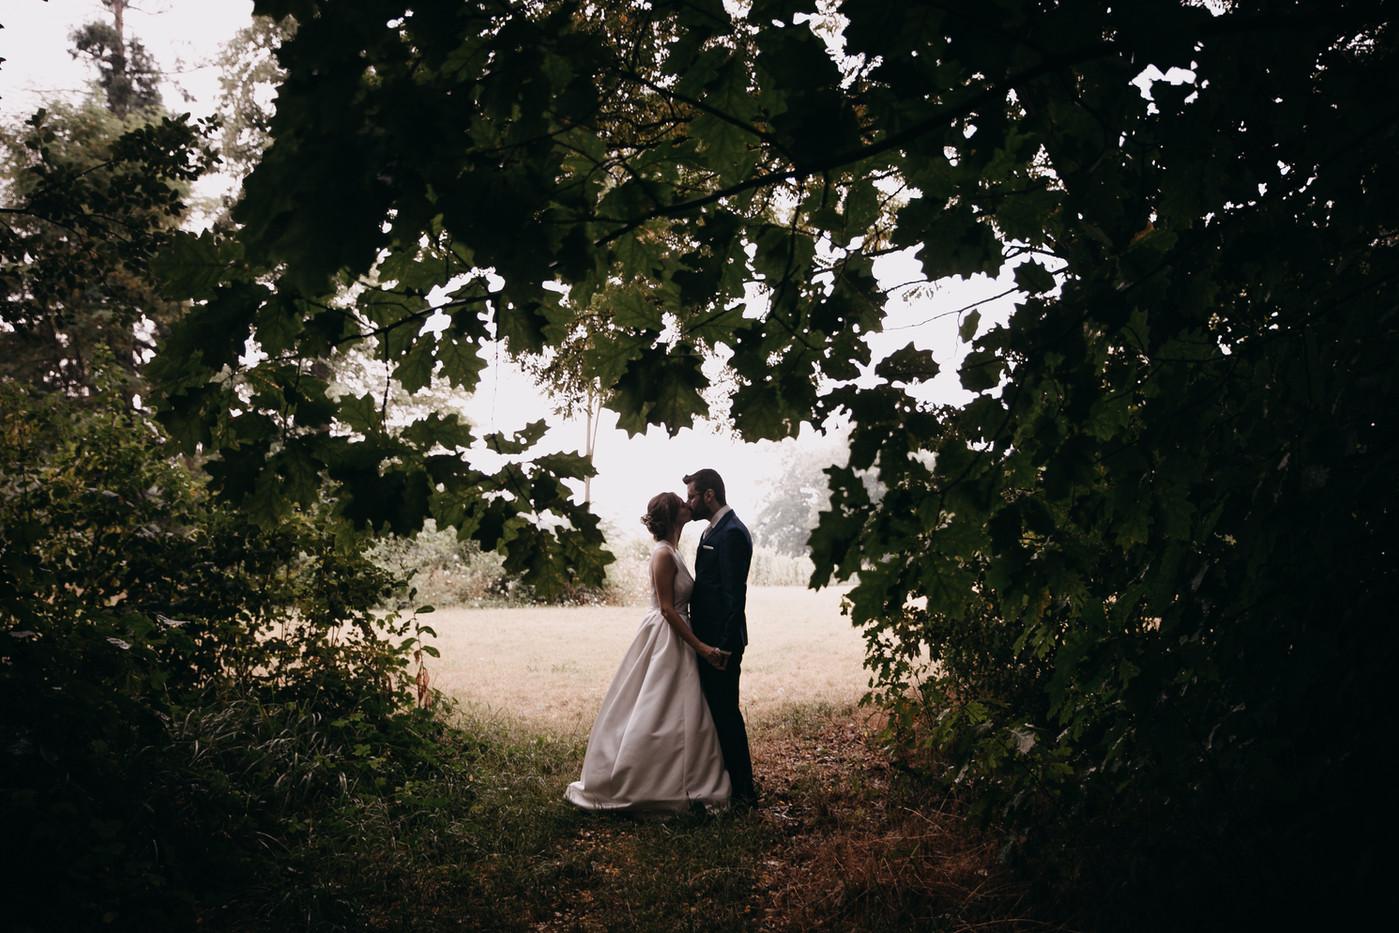 huwelijksfotogafie